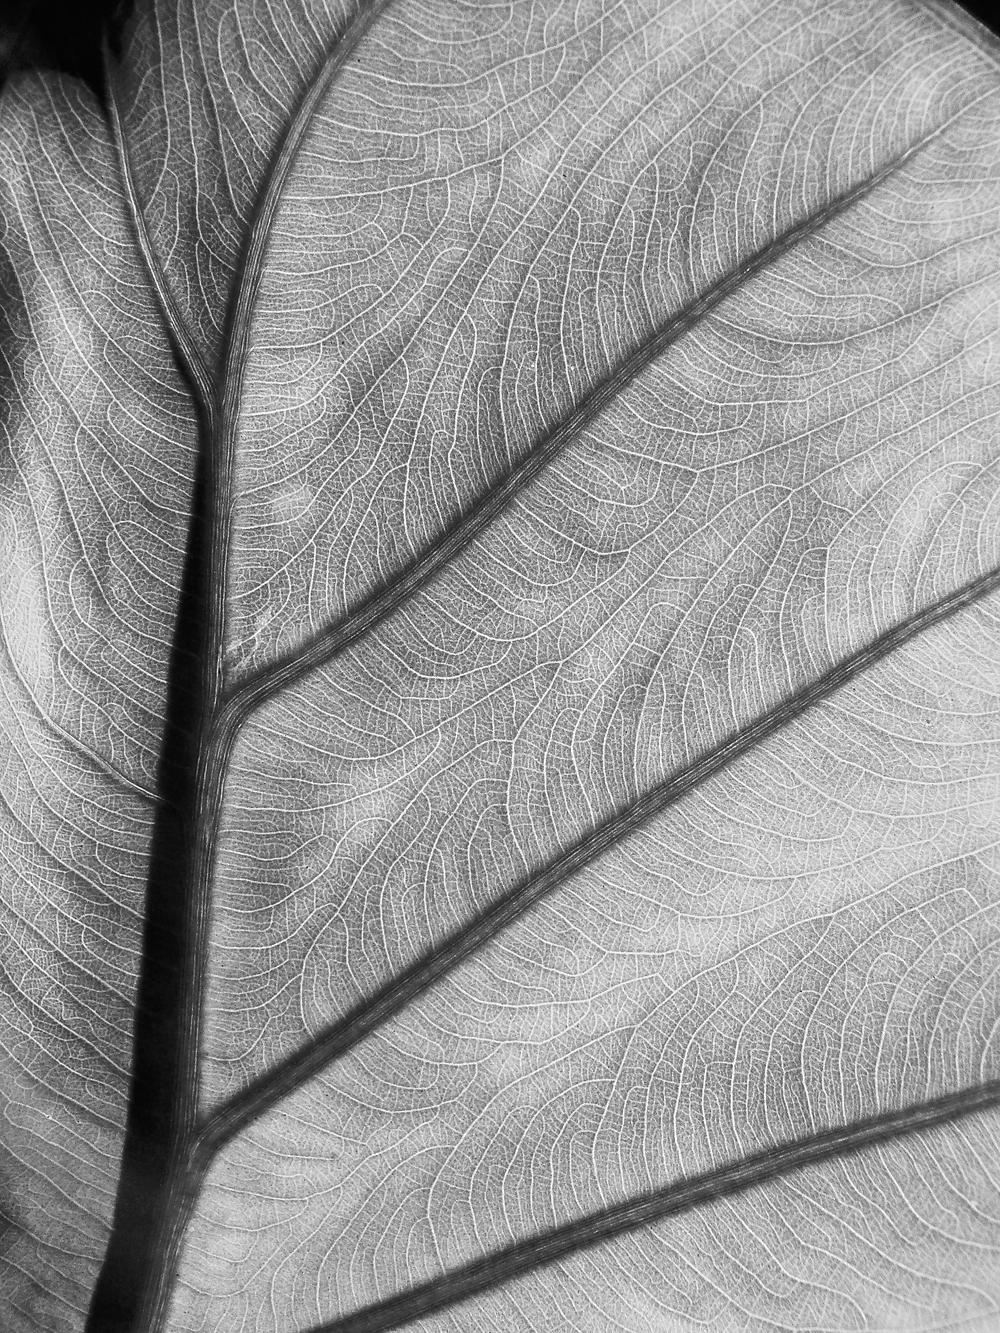 Tropical Leaf detail - black & white